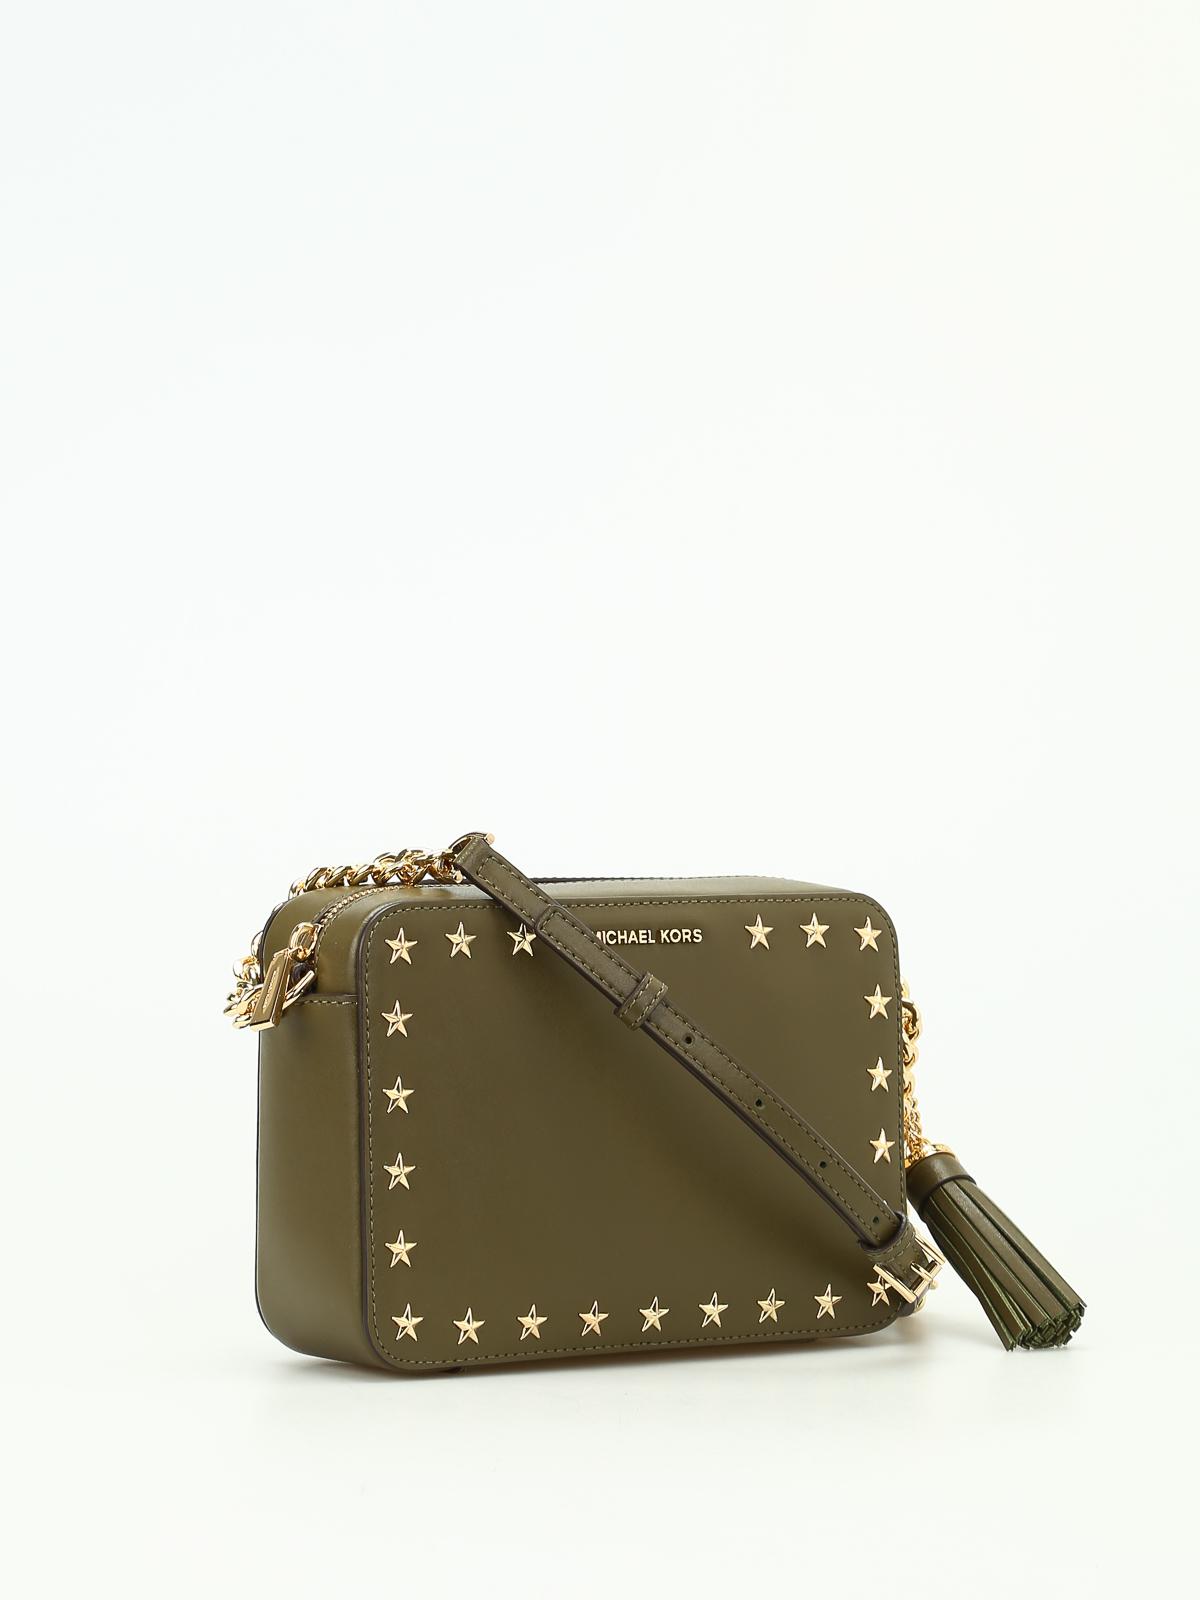 13477872ec6b MICHAEL KORS  cross body bags online - Ginny smooth leather camera bag